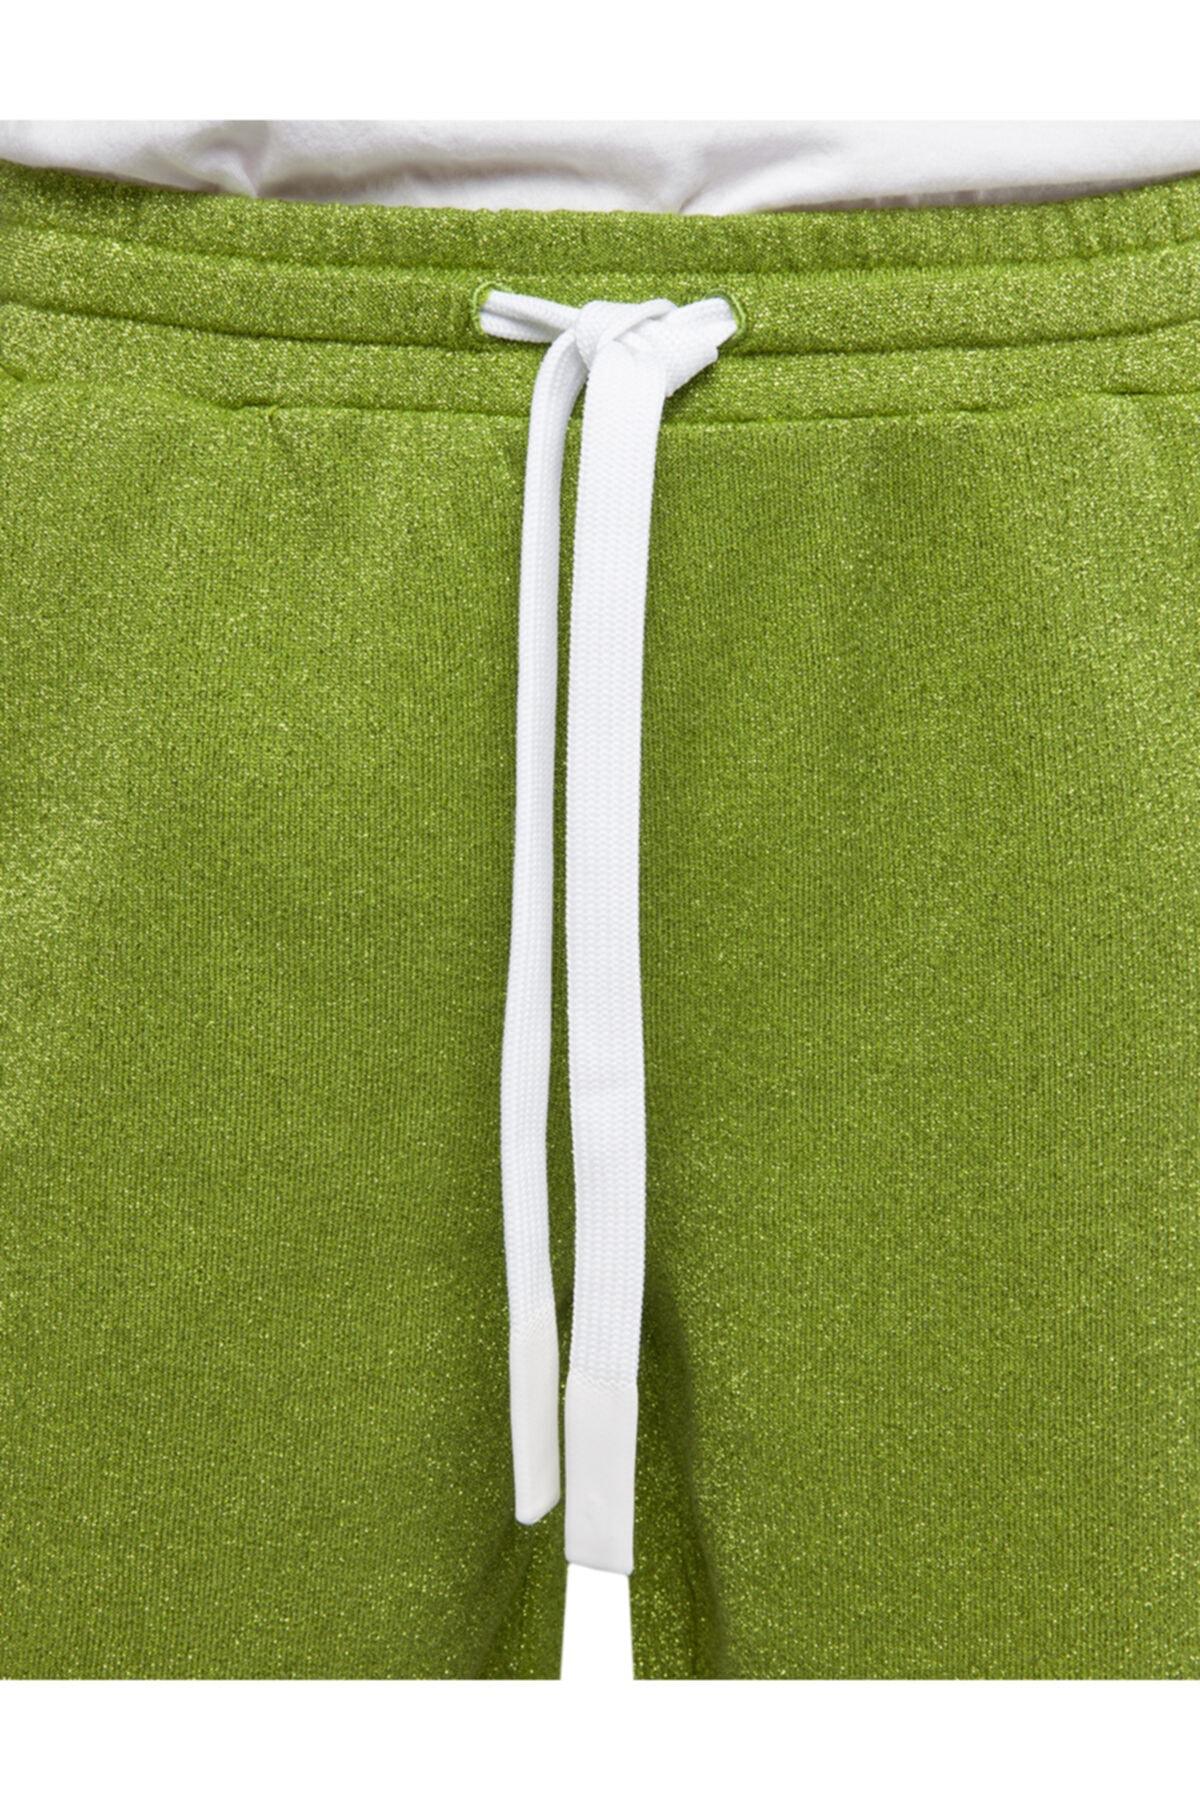 Replay Pantaloncino Lurex Fleece 2